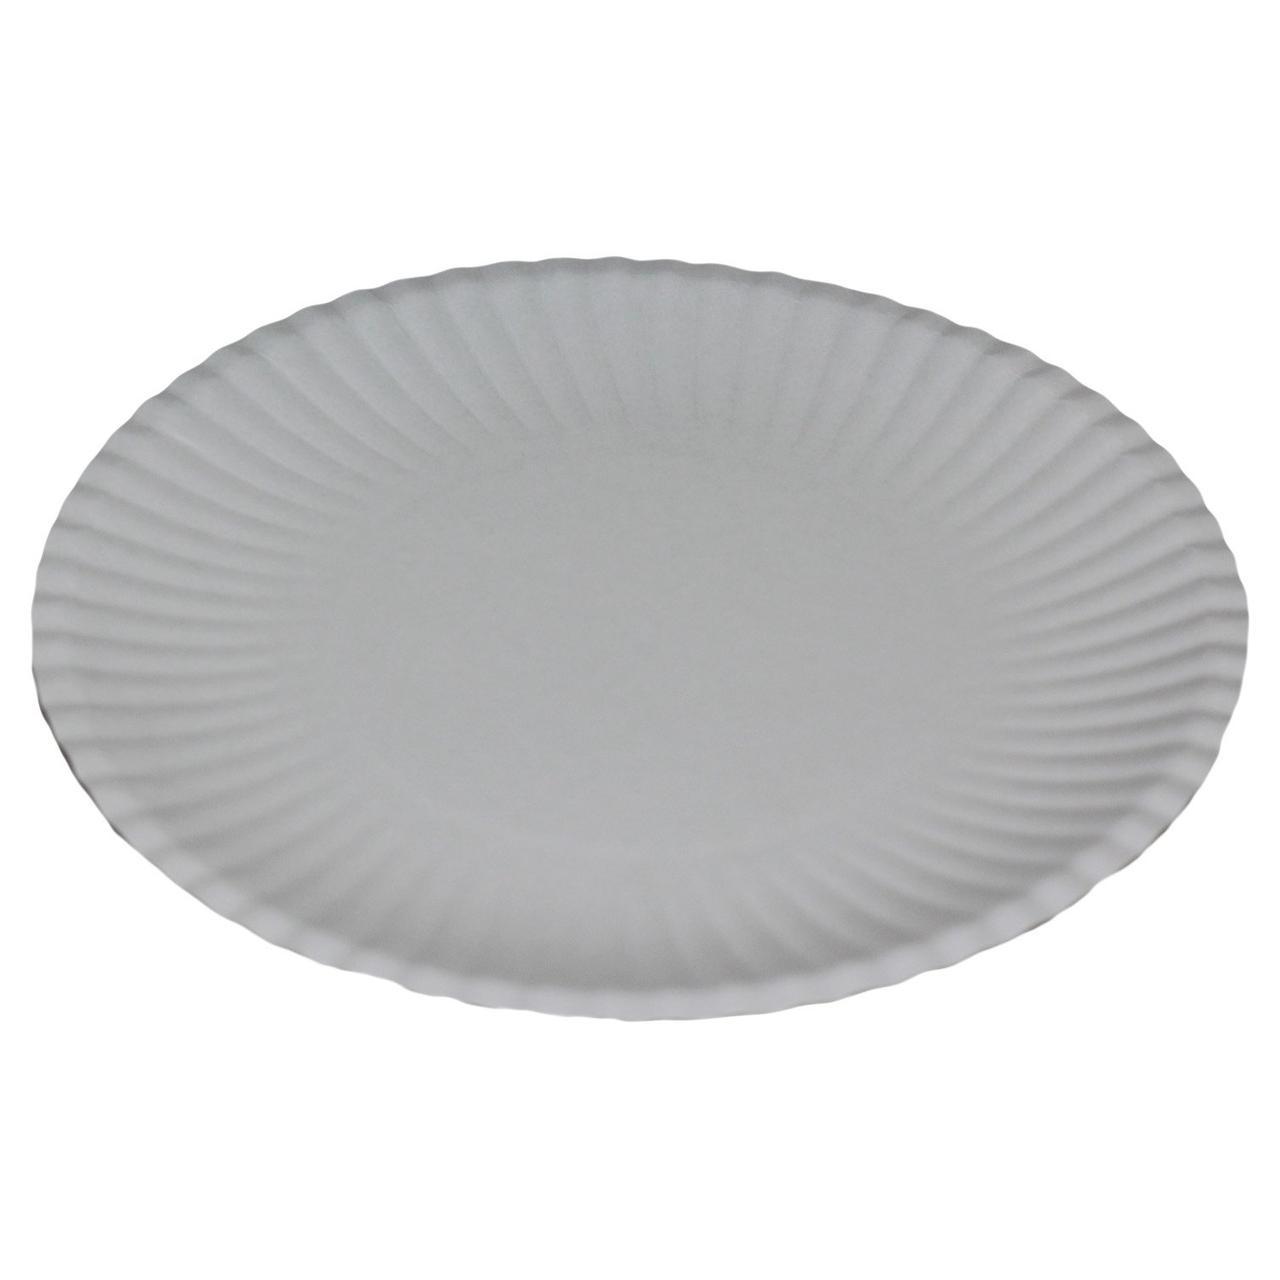 Тарелка d 240мм, мелован., бел., картон, 700 шт